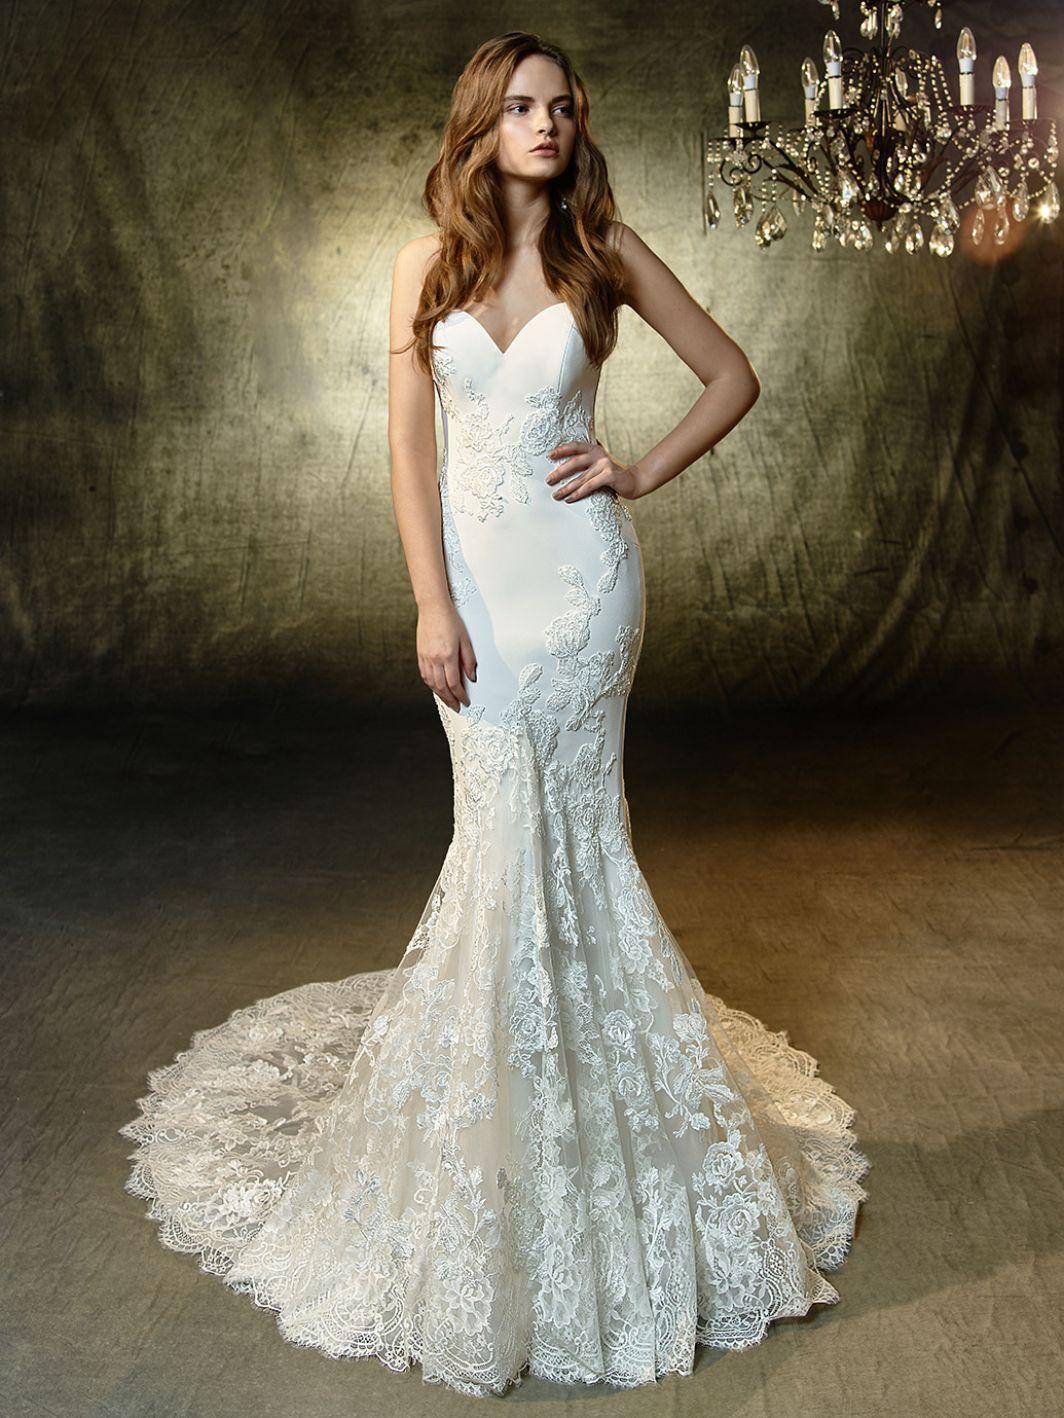 Royal Blue Mermaid Wedding Dresses For Slim Bridal Look Ball Gown Dresses Blue Mermaid Prom Dress Dresses [ 1200 x 900 Pixel ]